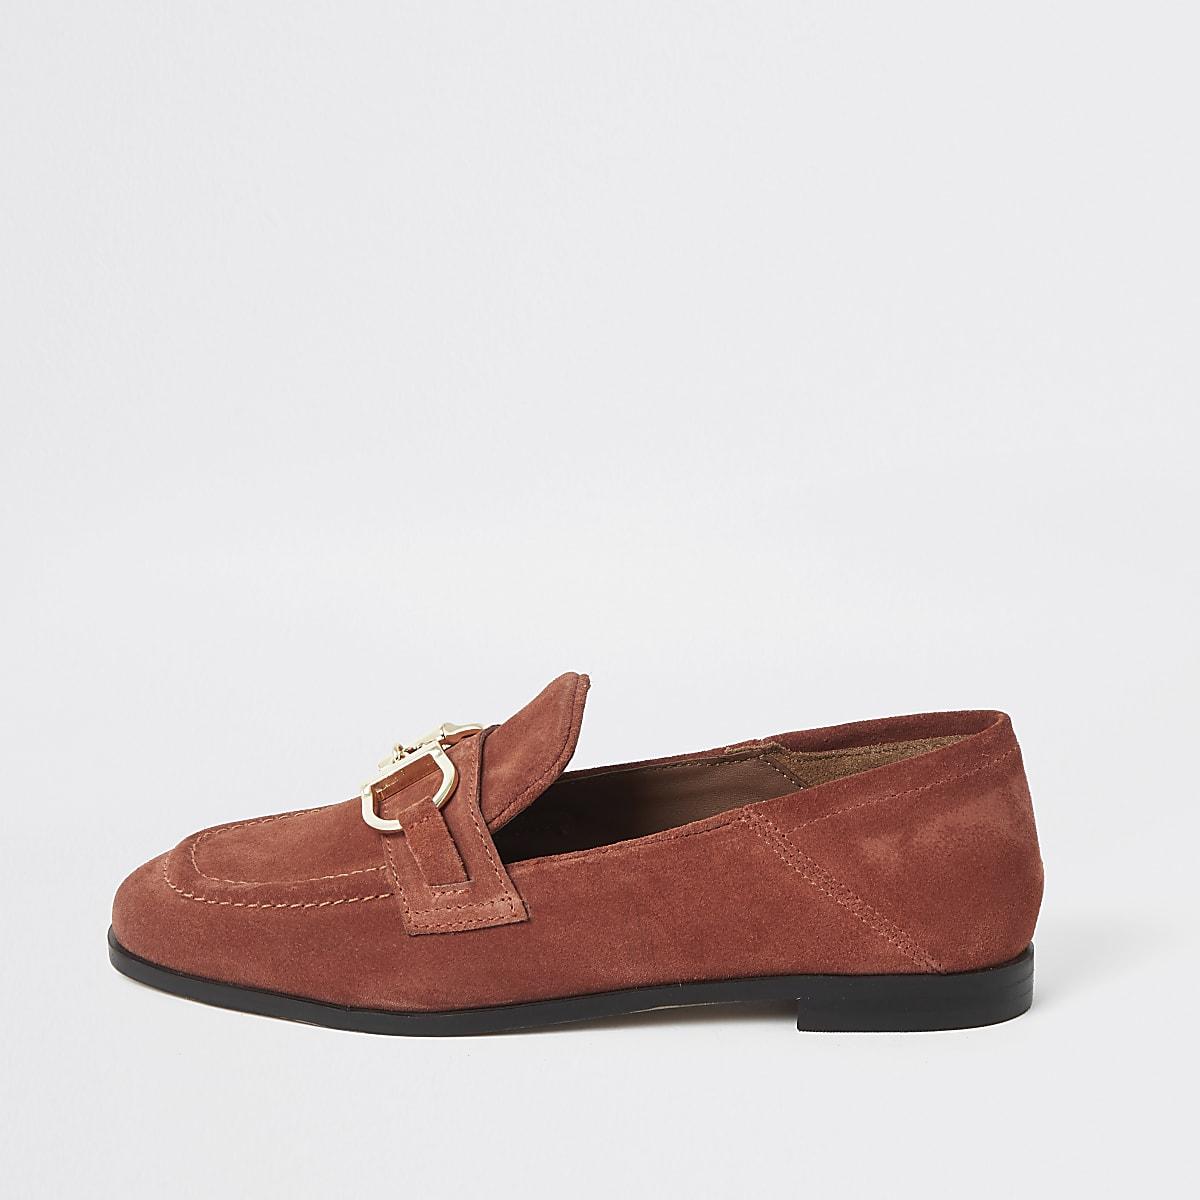 Oranje leren loafers